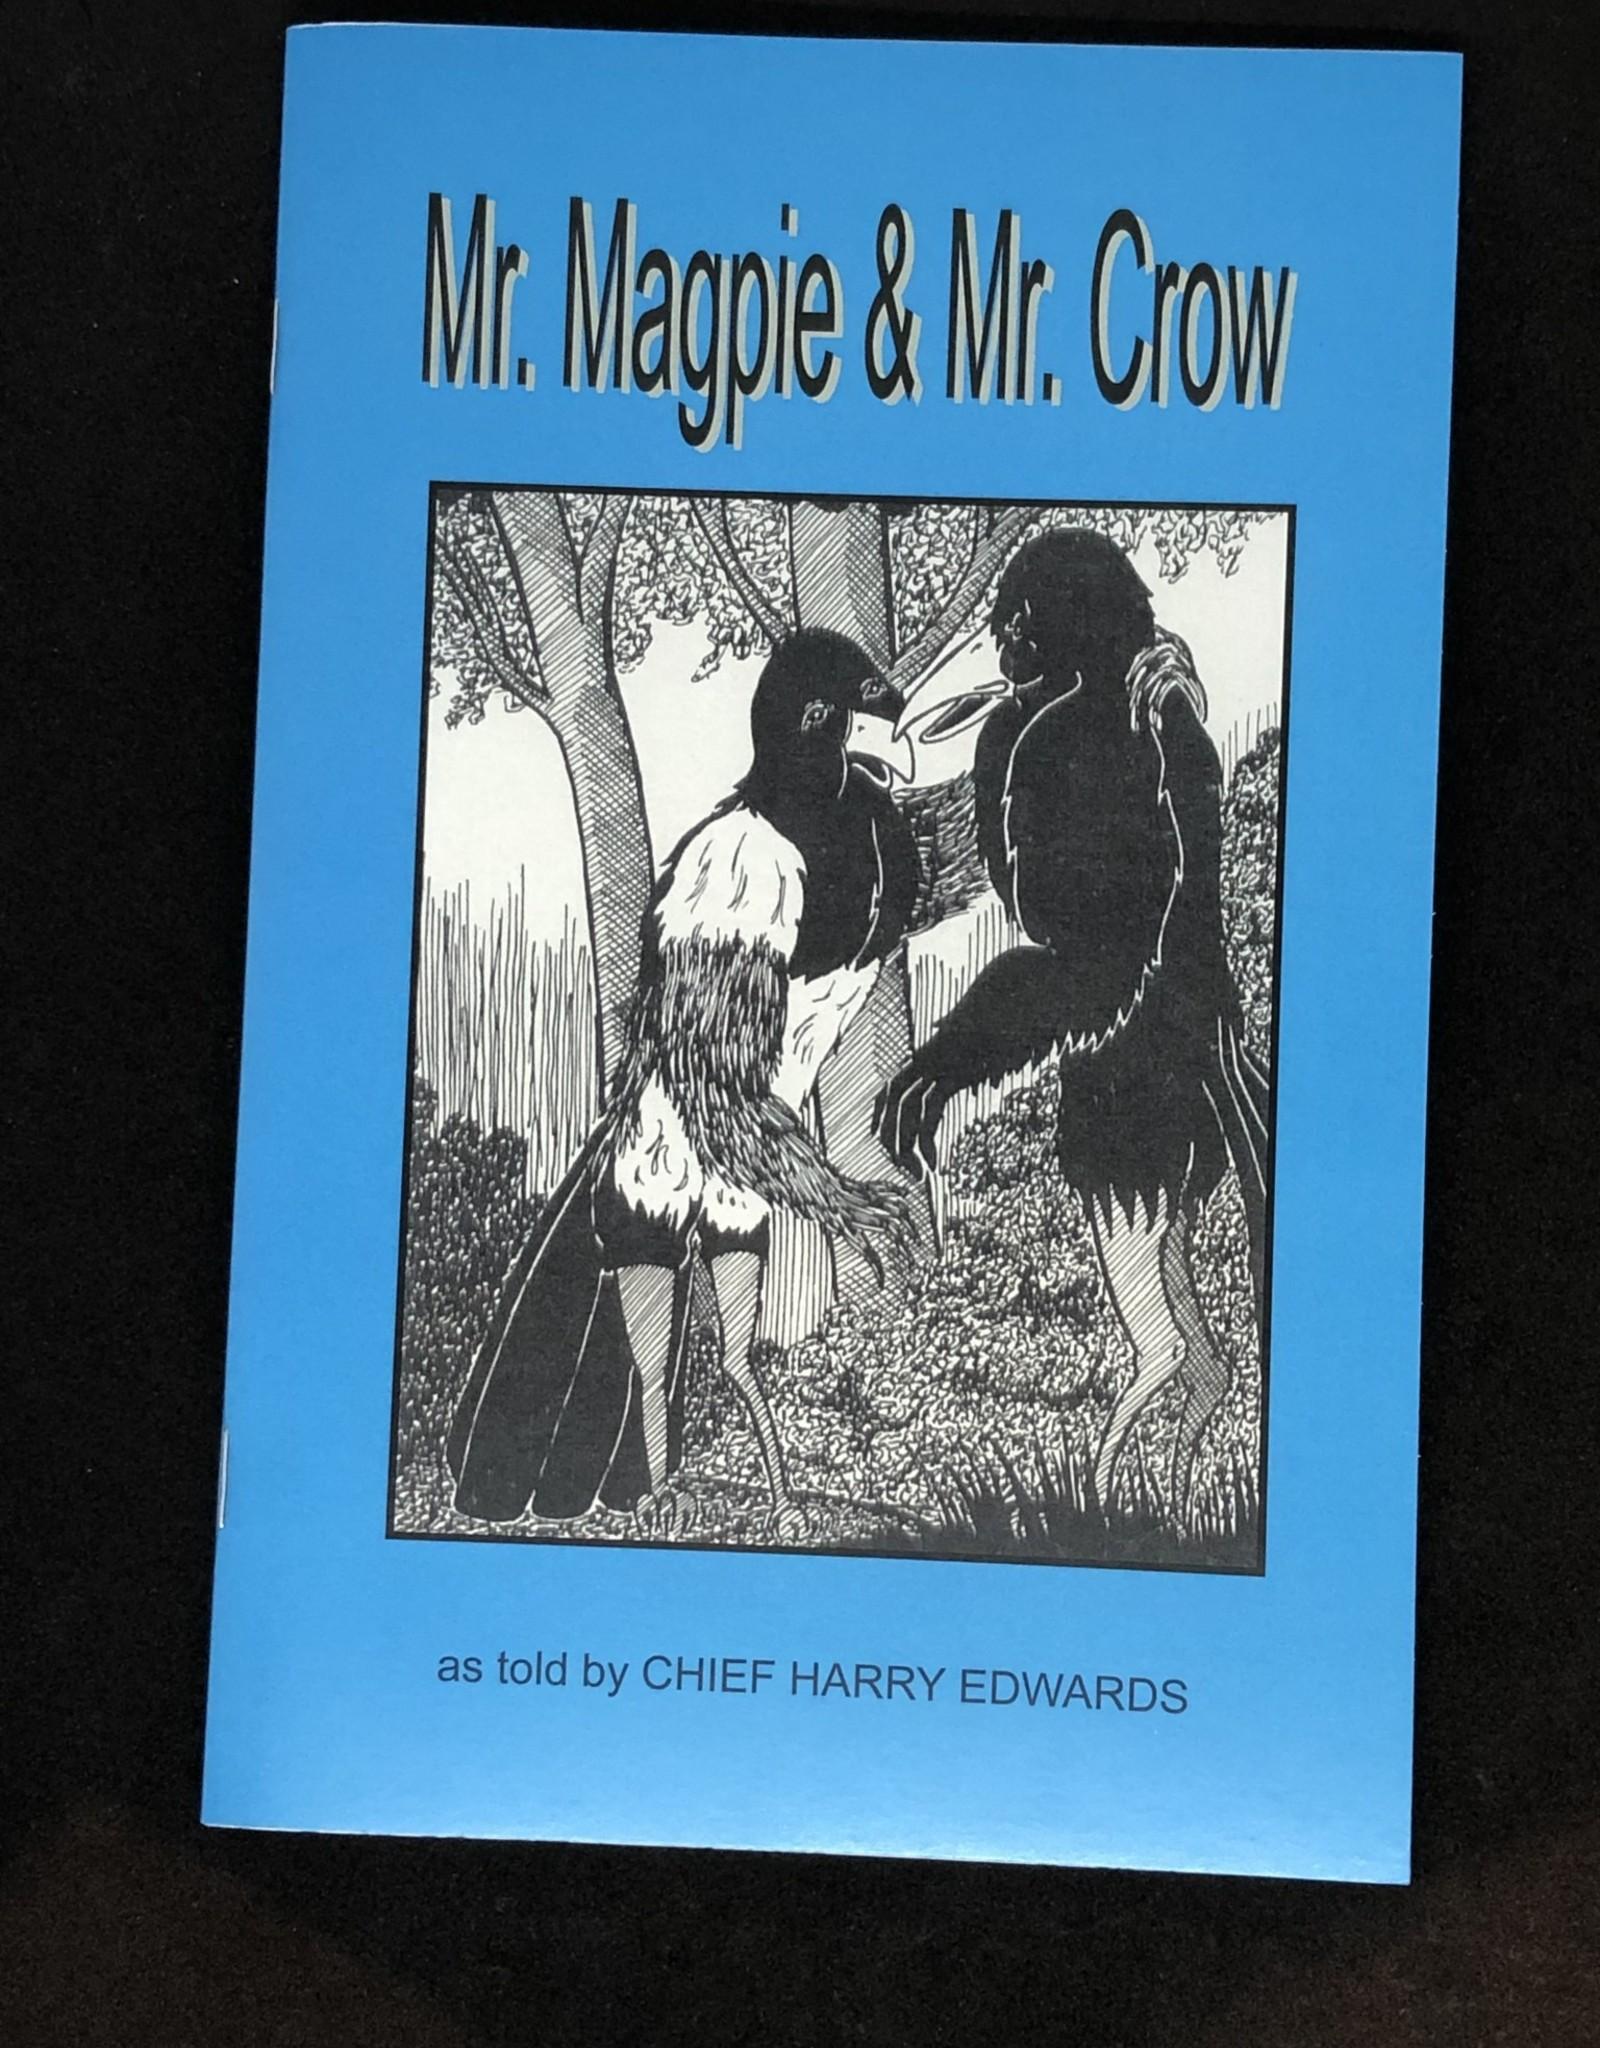 Book-Mr. Magpie & Mr. Crow